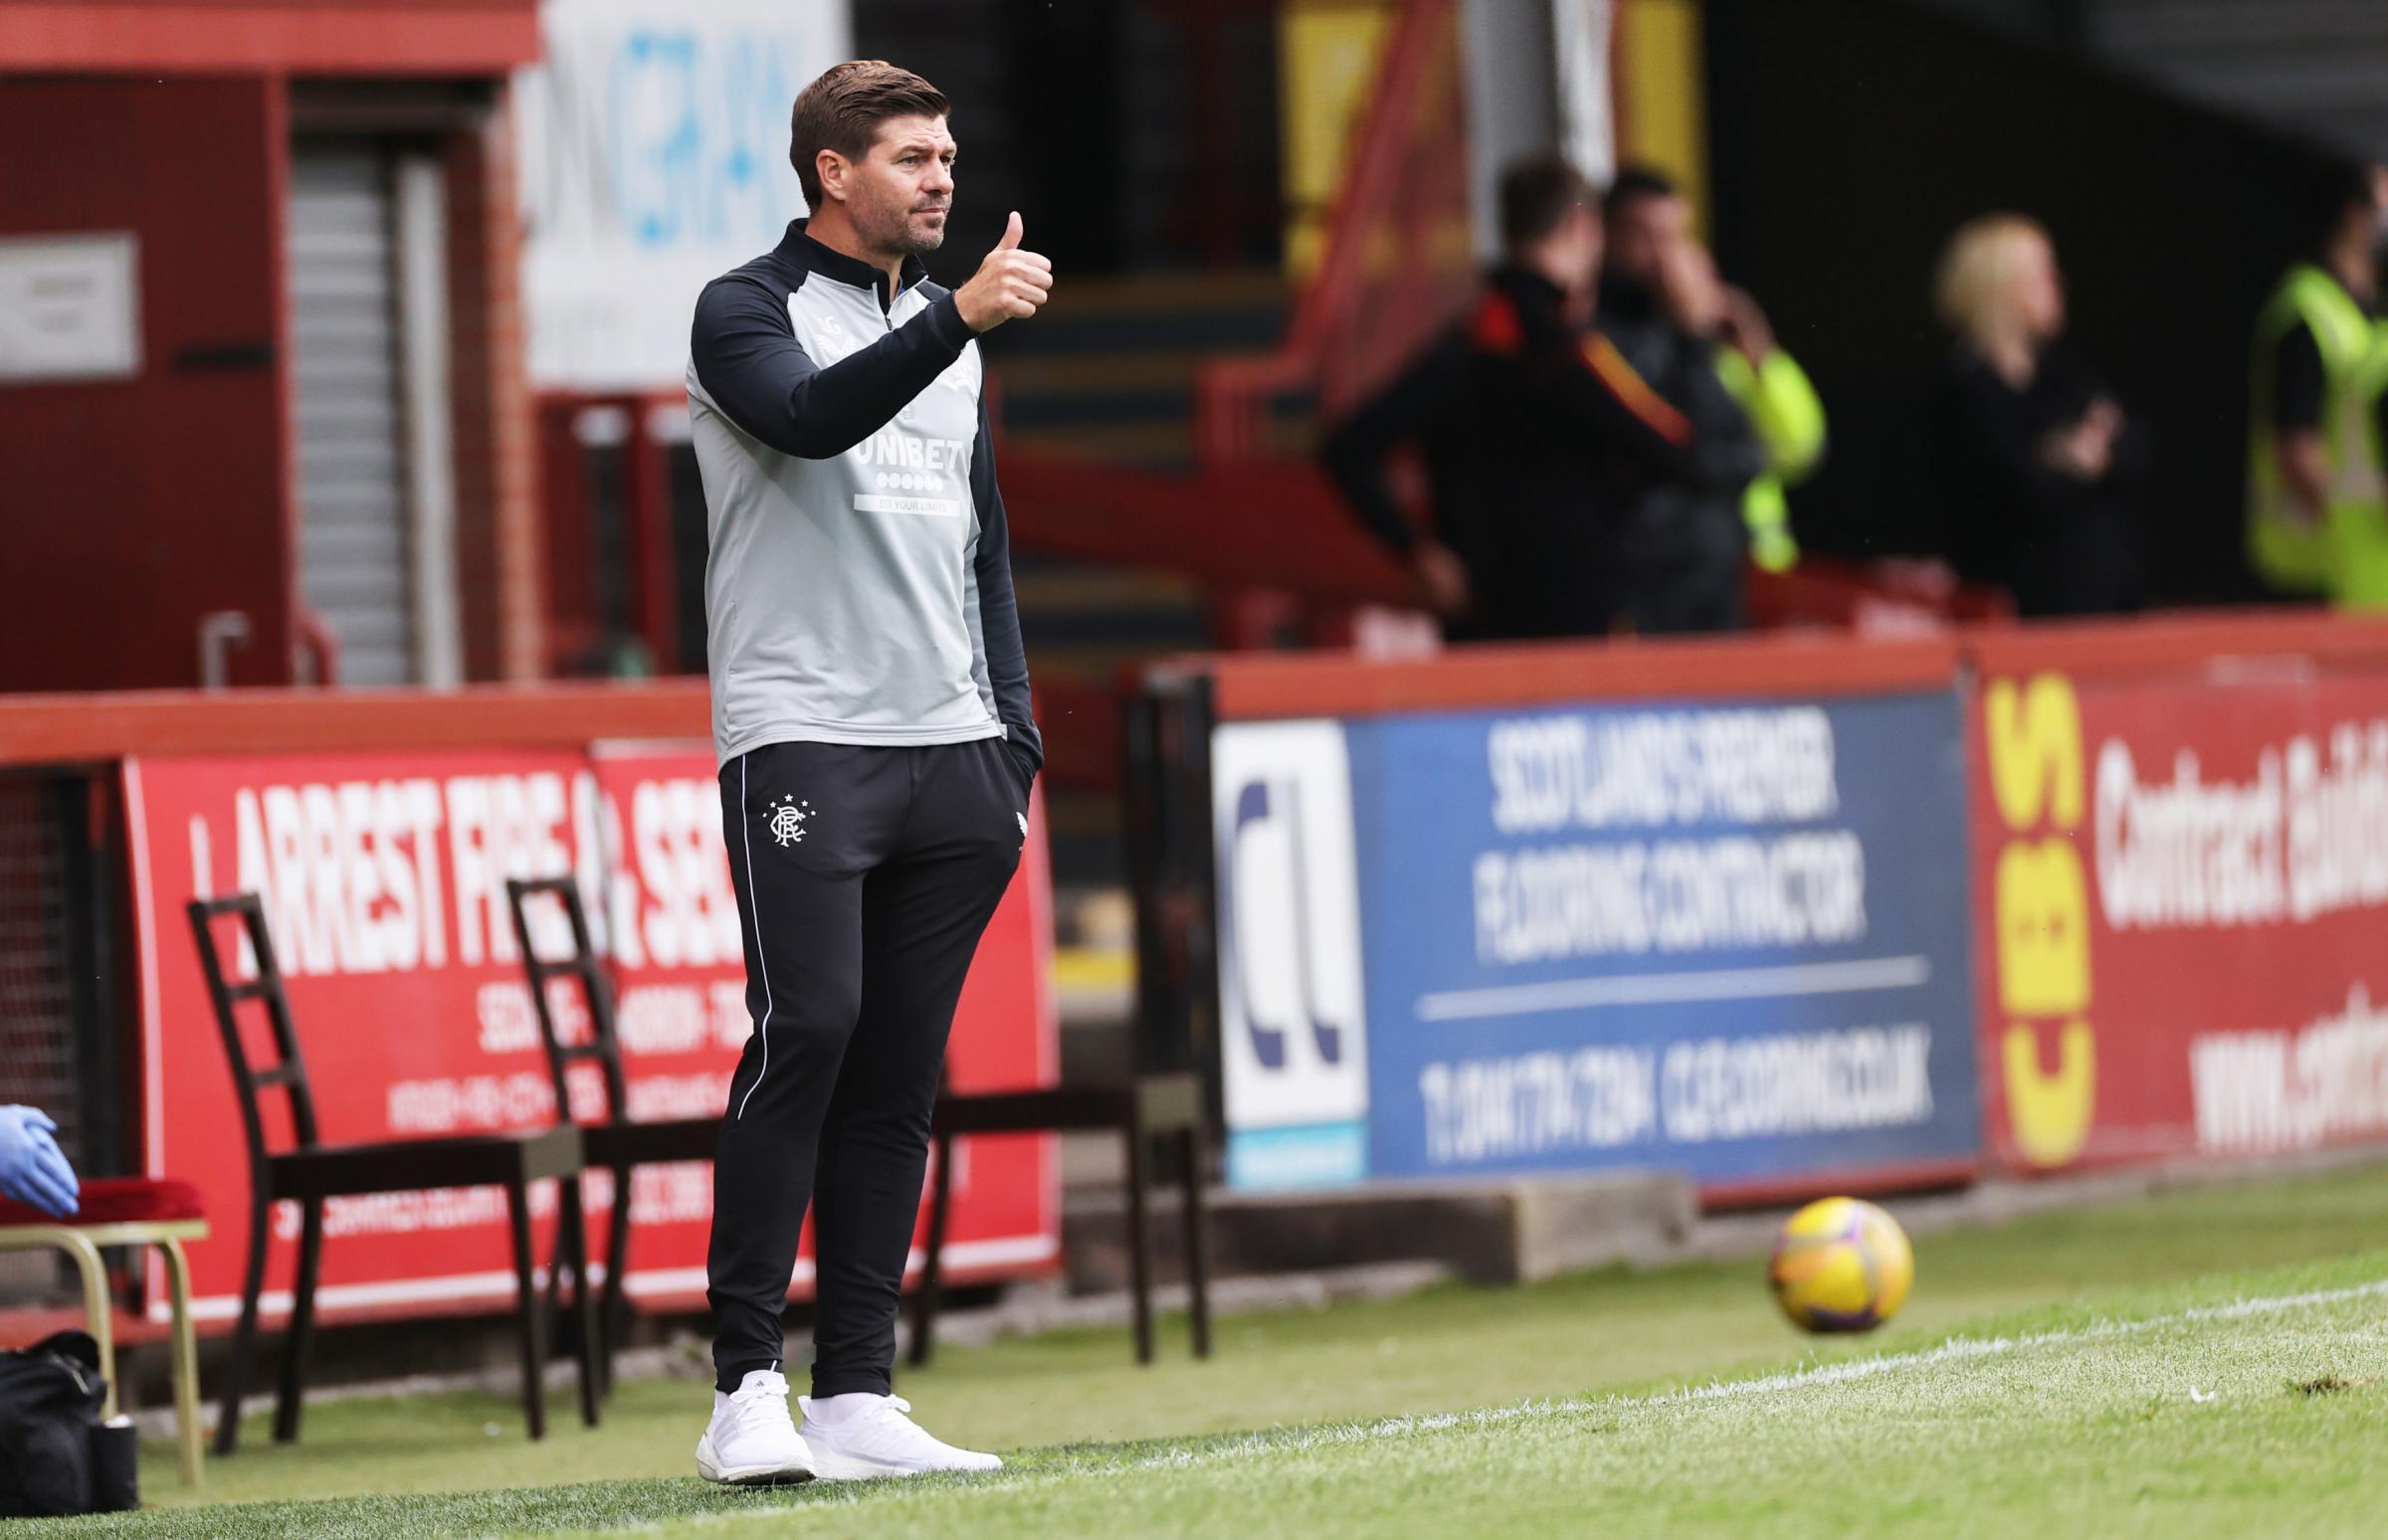 Alex McLeish: Steven Gerrard will have Rangers focused on 56 after Premiership title celebrations